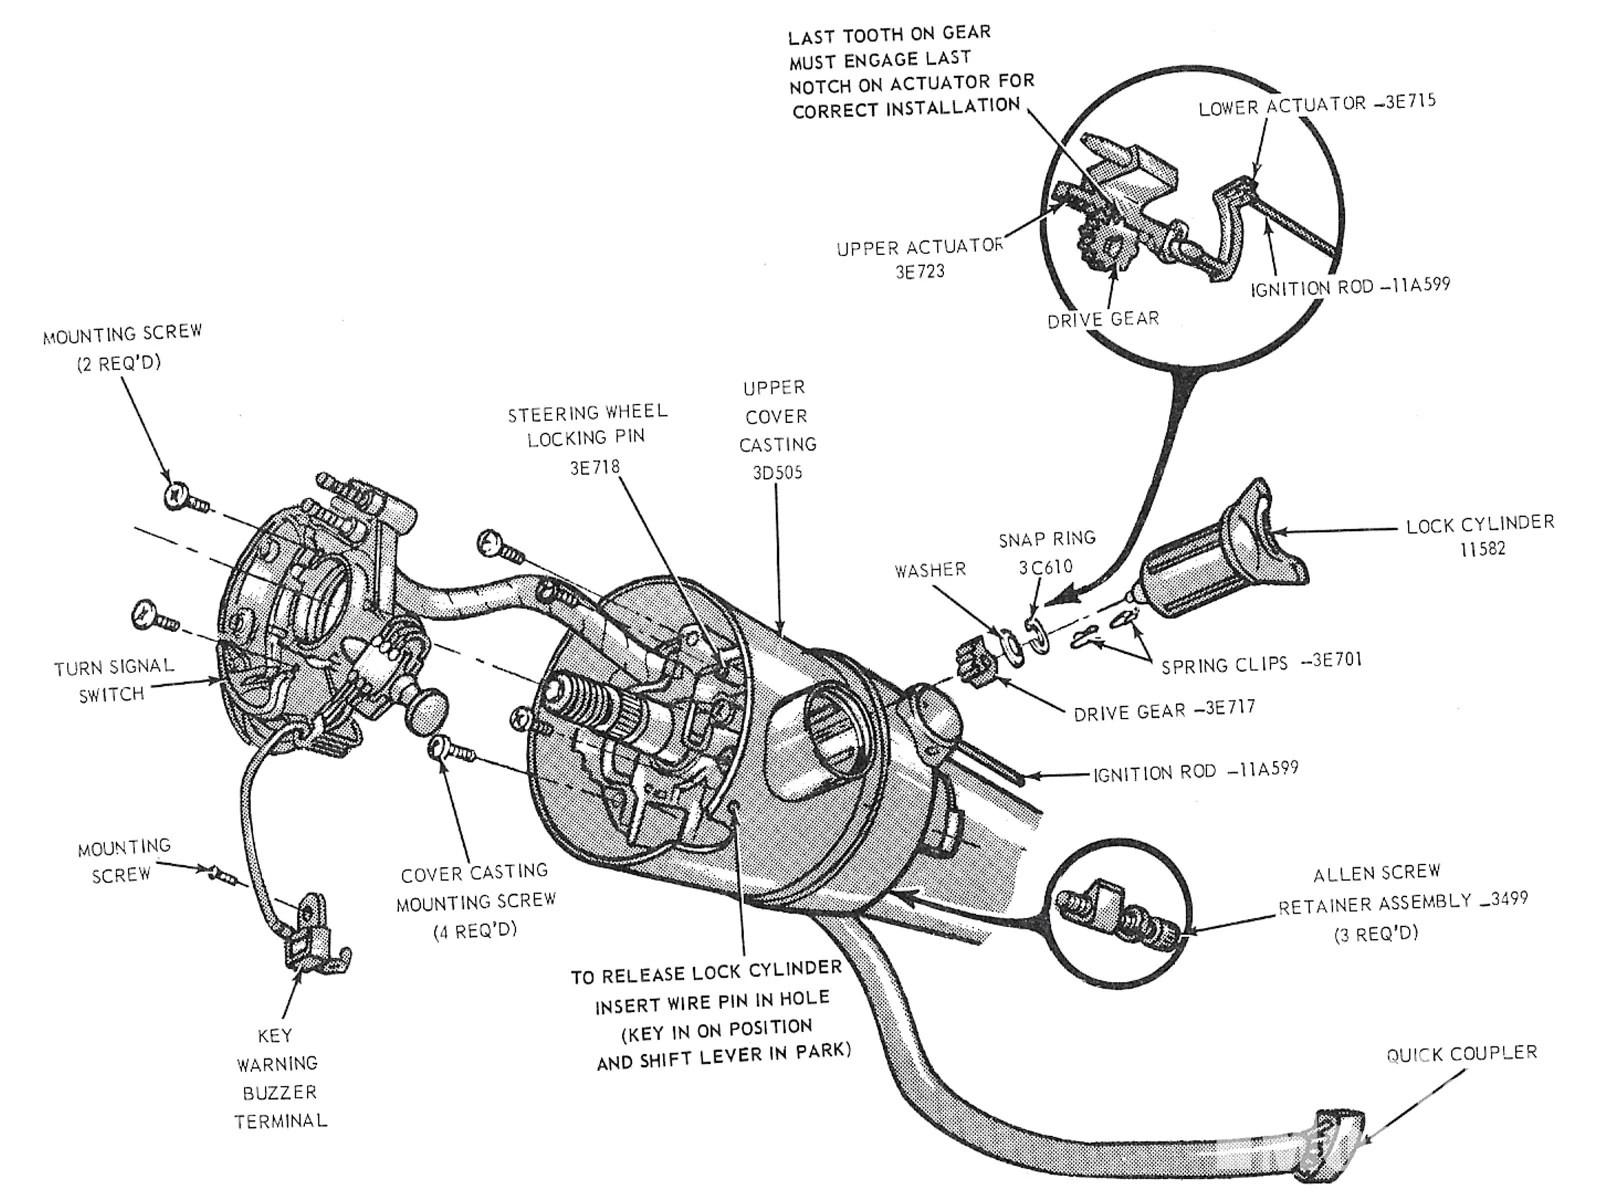 hight resolution of mump 1012 04 ford mustang locking steering columns locking tilt column diagram